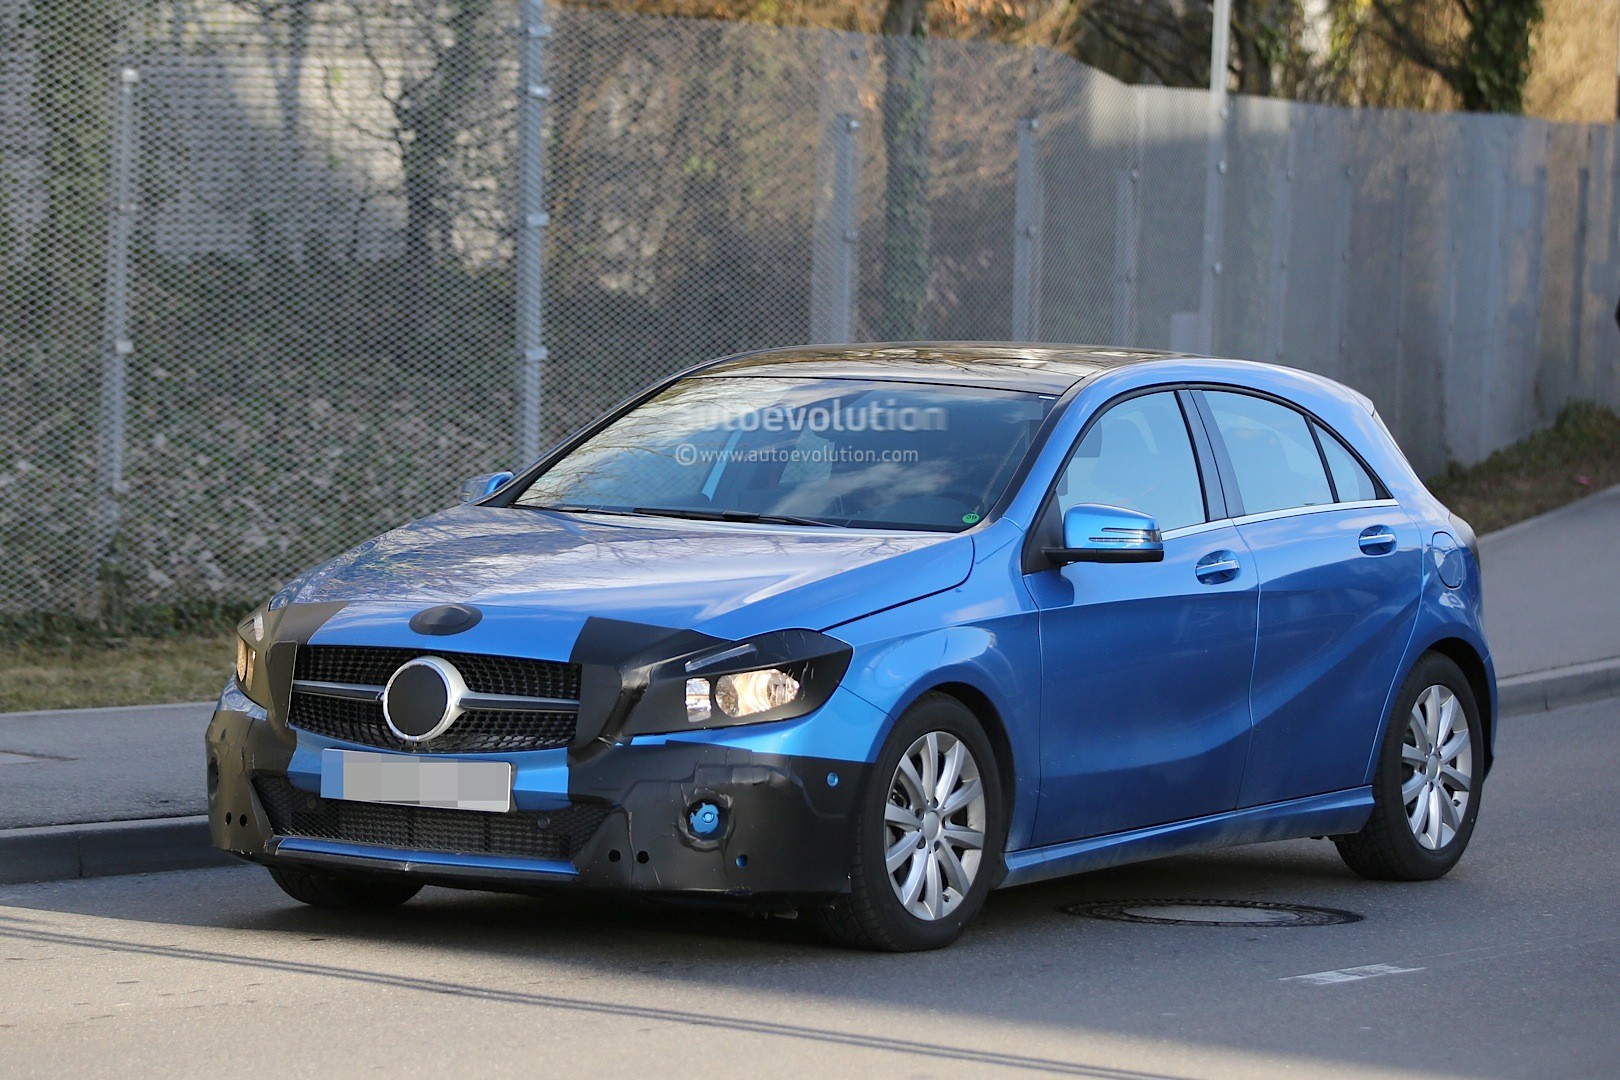 2016 - [Mercedes] Classe A restylée - Page 5 Spyshots-2015-mercedes-a-class-facelift-getting-headlight-tweaks_2